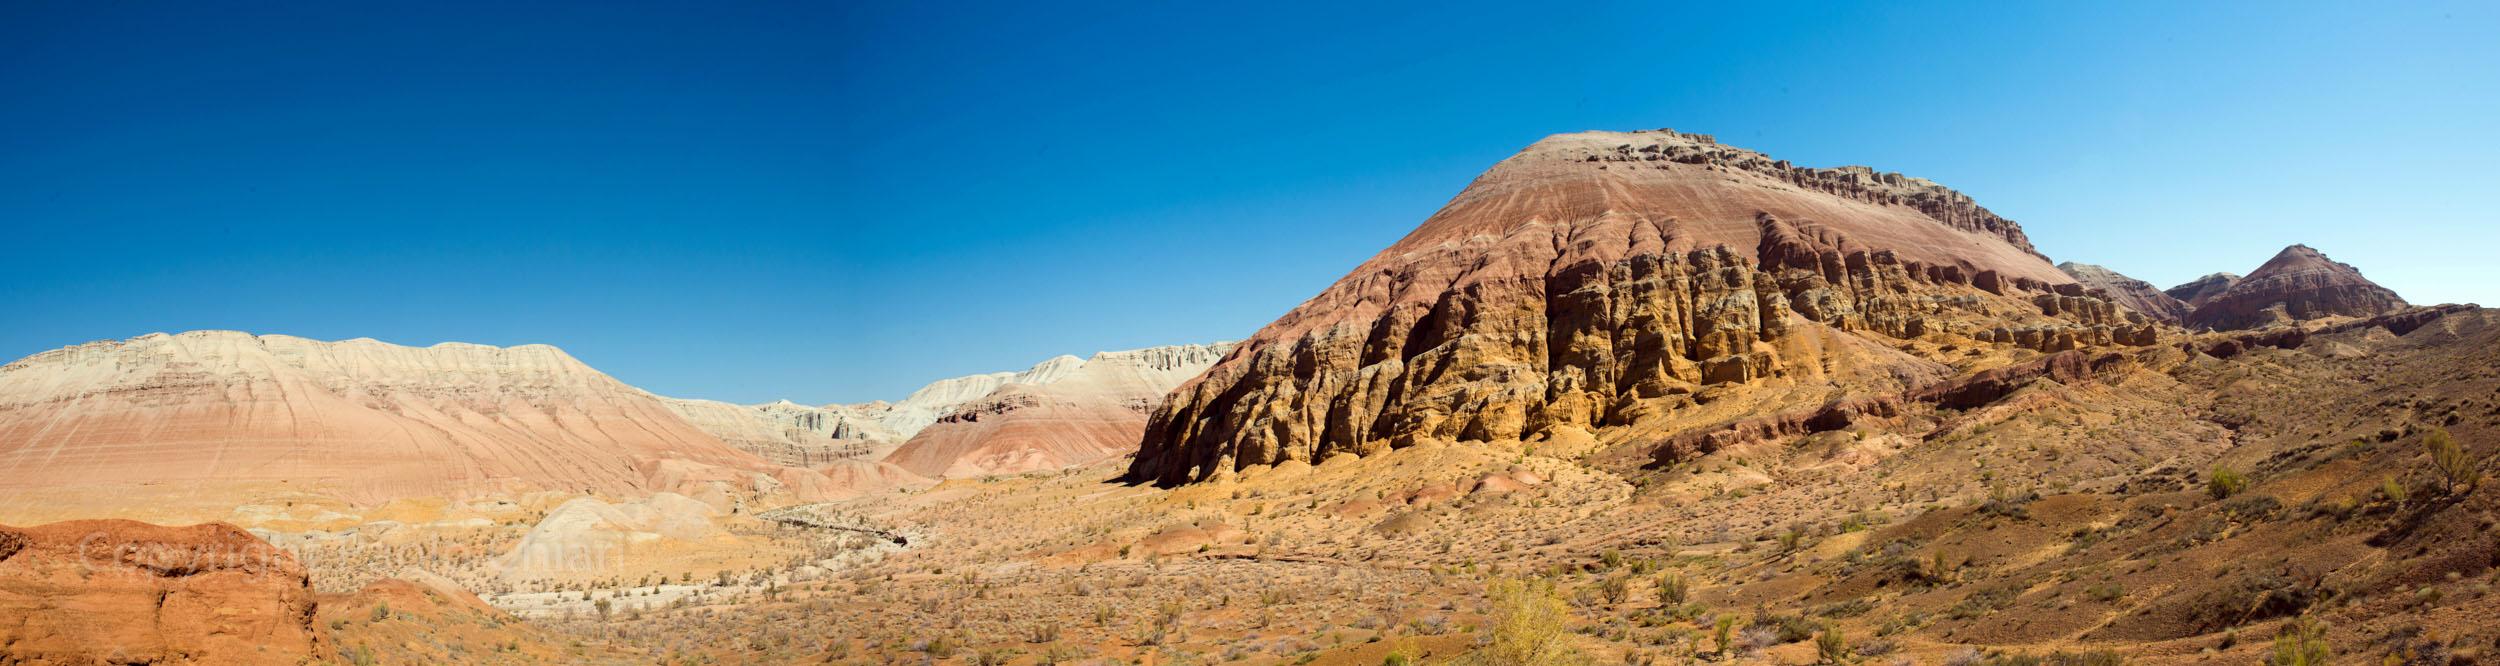 Panoramica_deserto2